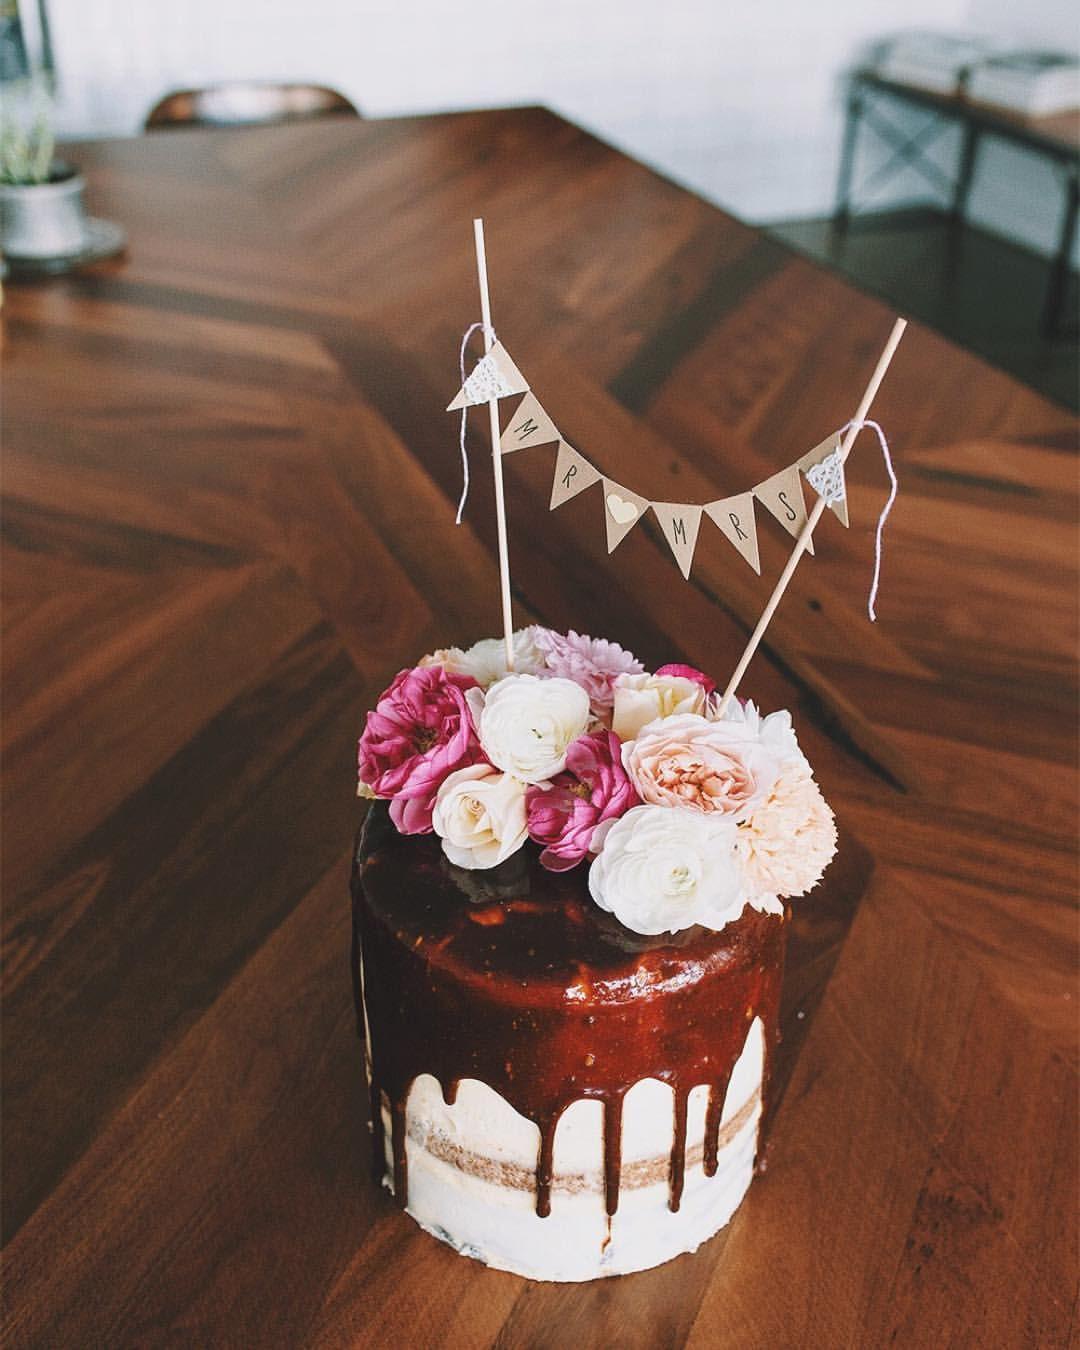 One of three wedding cakes on this fine sunday u layers of